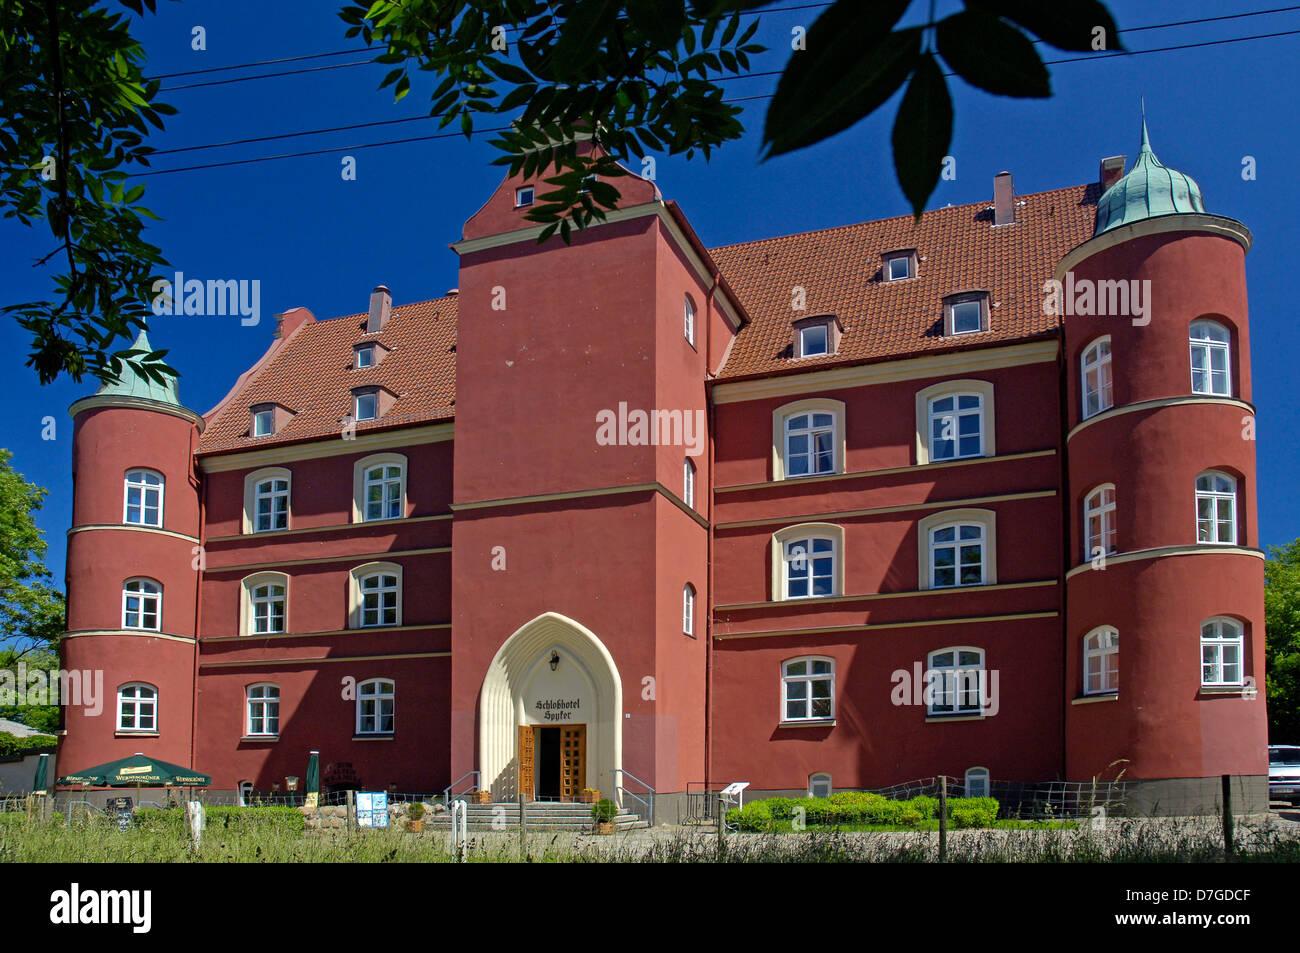 Germany, Mecklenburg-West Pomerania, island Rügen, Spyker, castle - Stock Image